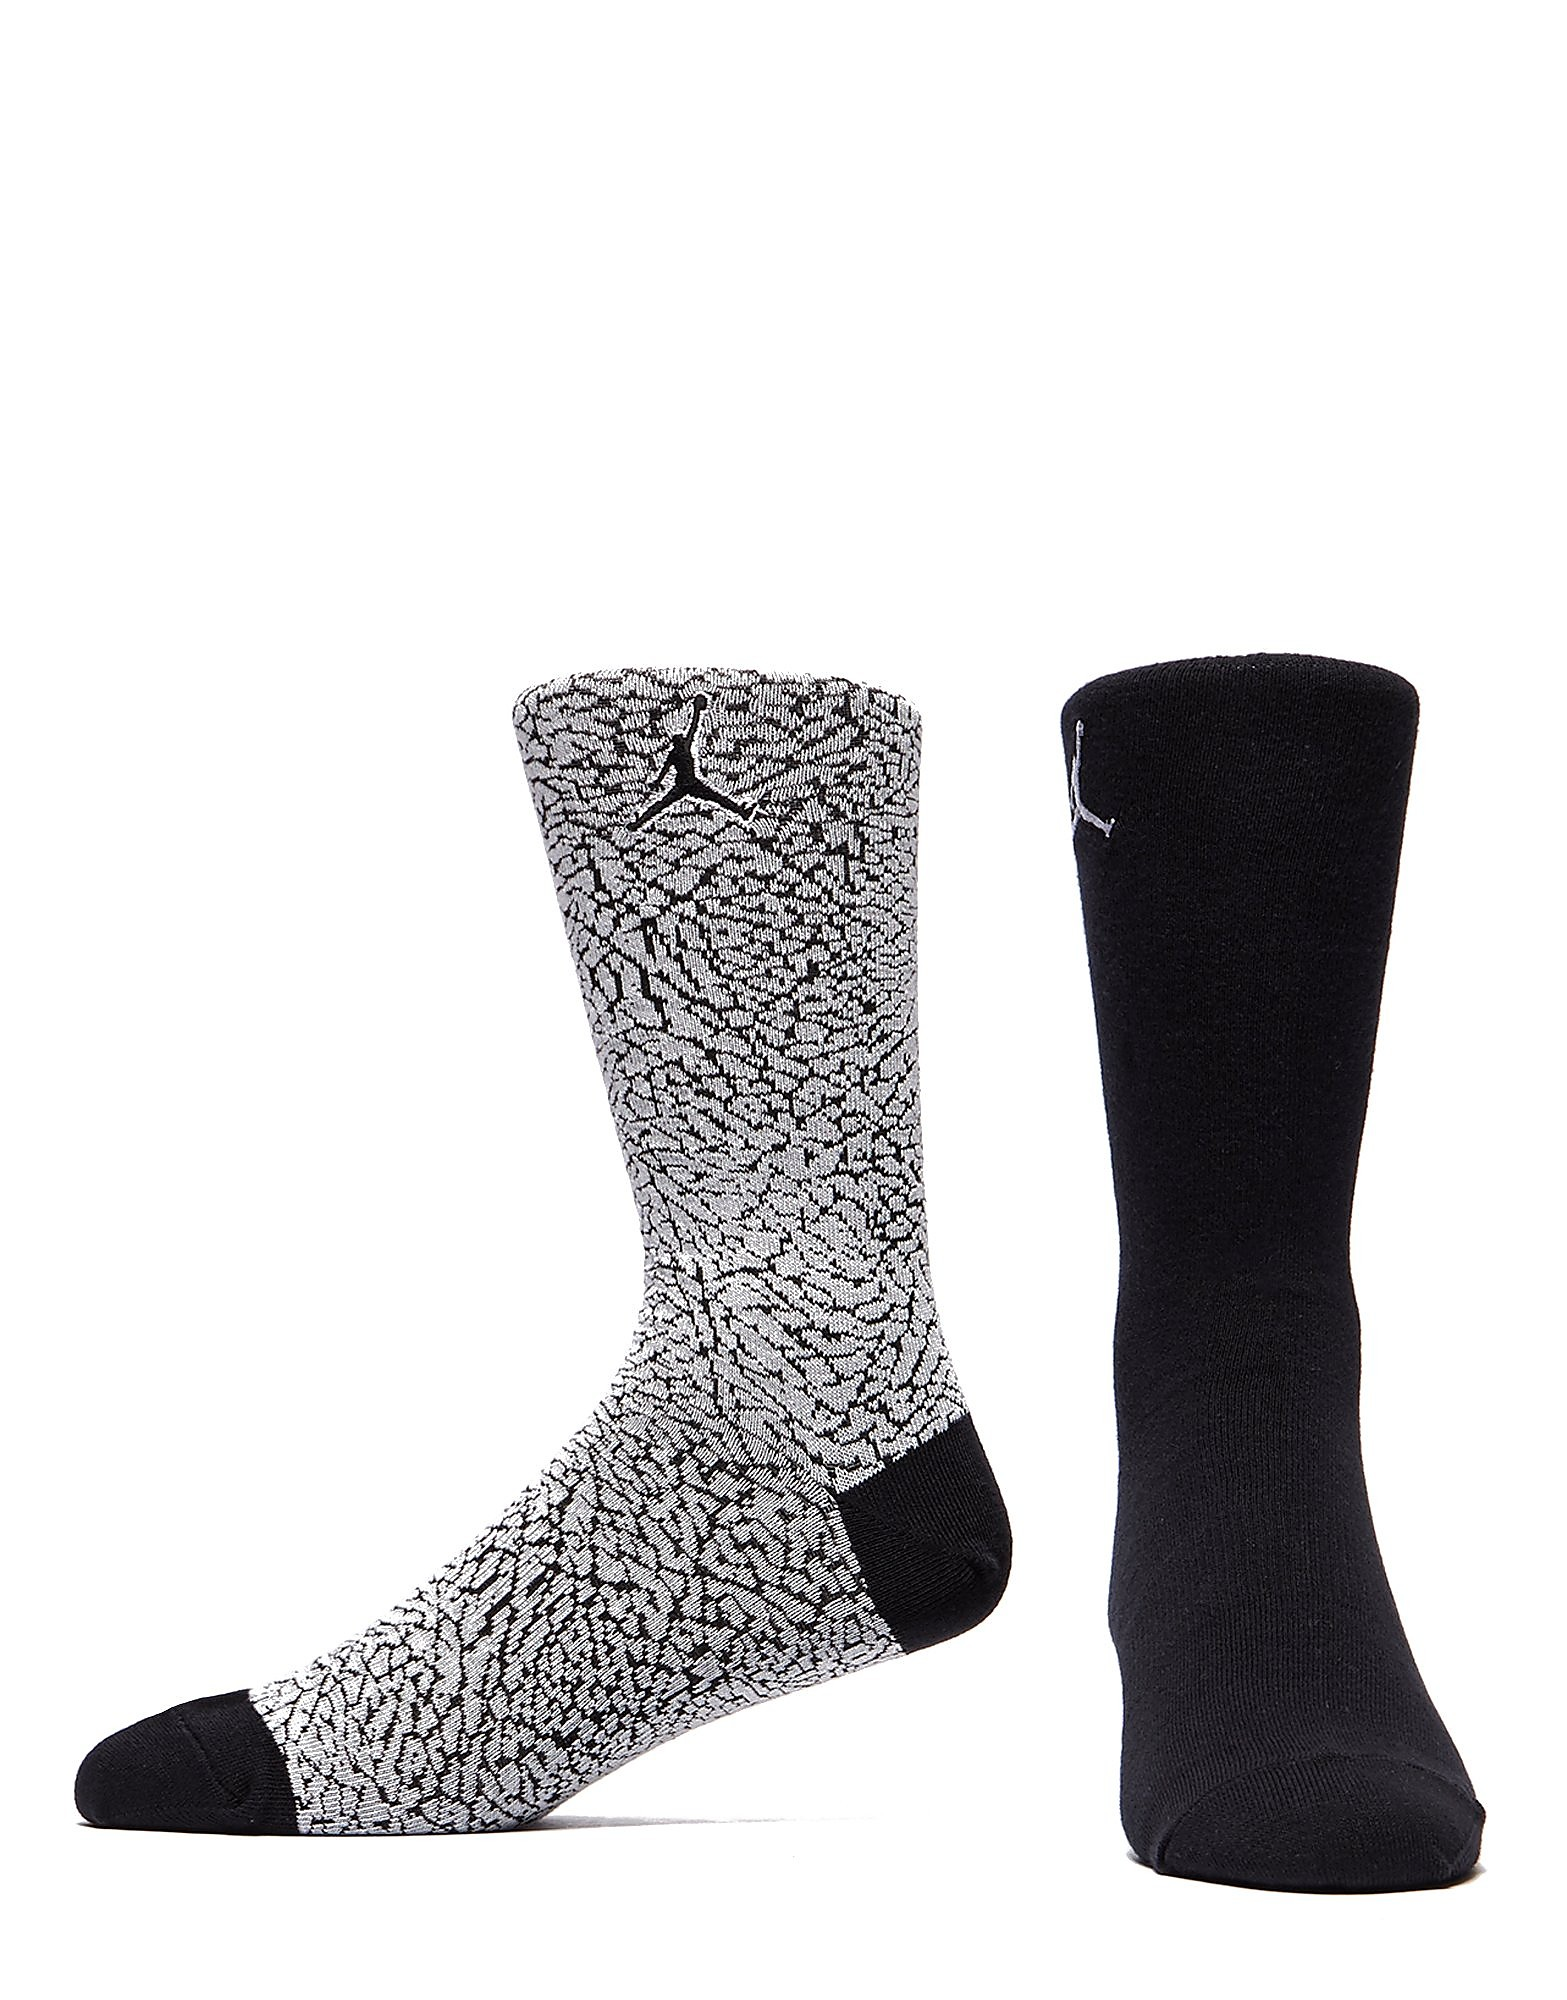 Jordan pack de 2 calcetines Elephant Print